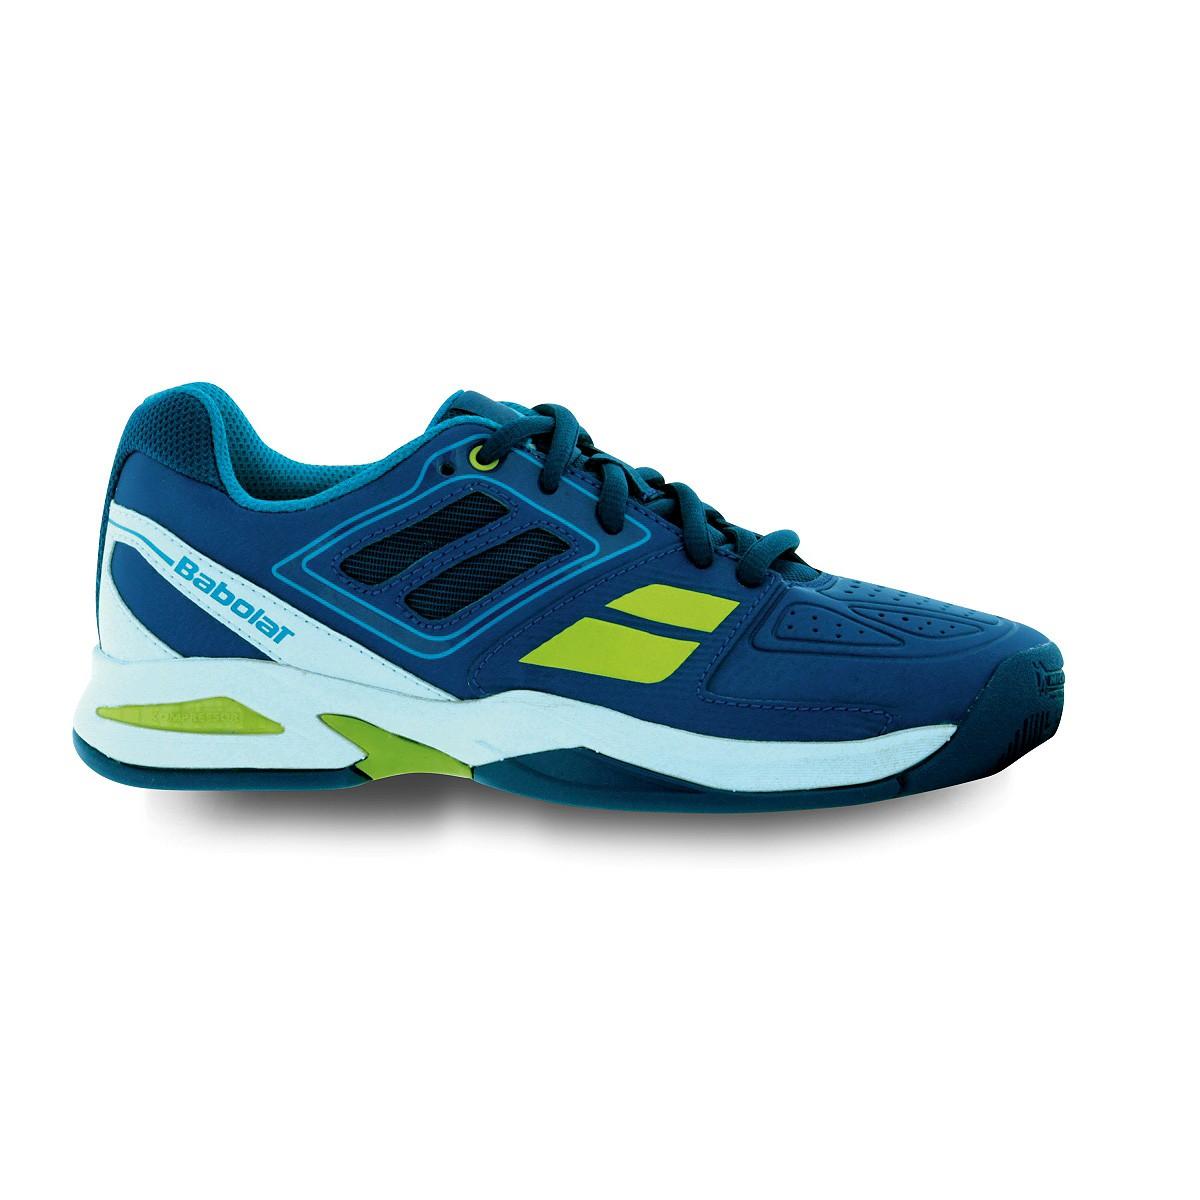 Buty tenisowe Babolat Propulse Team BPM Junior Blue - Wyprzedaż!